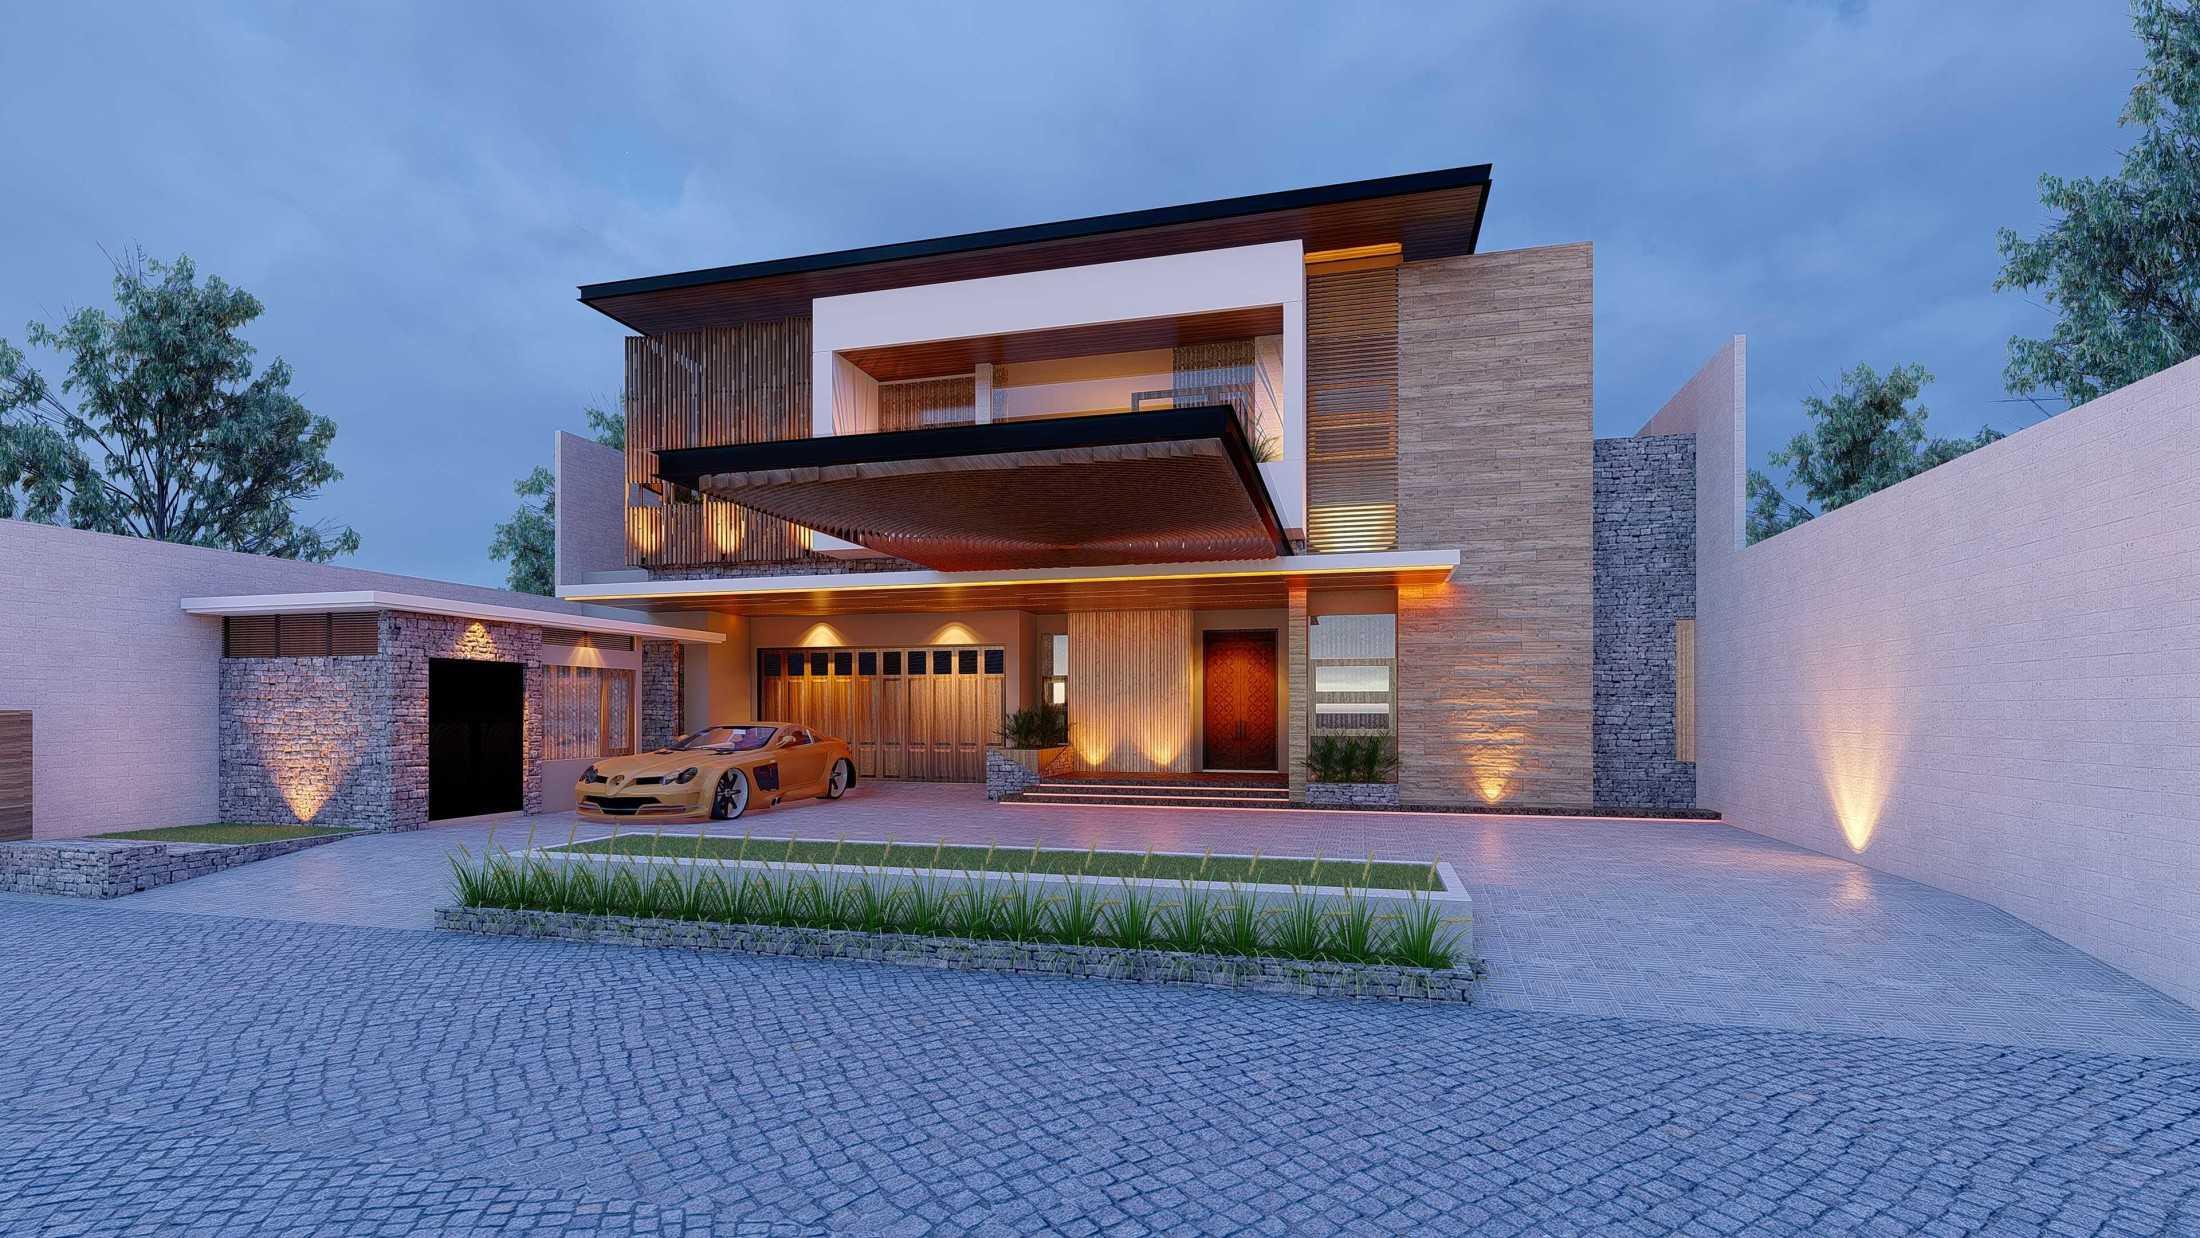 Conarch Studio Mrs. Regina's House Semarang, Kota Semarang, Jawa Tengah, Indonesia Semarang, Kota Semarang, Jawa Tengah, Indonesia Conarch-Bangun-Sejahtera-Mrs-Reginas-House  79513